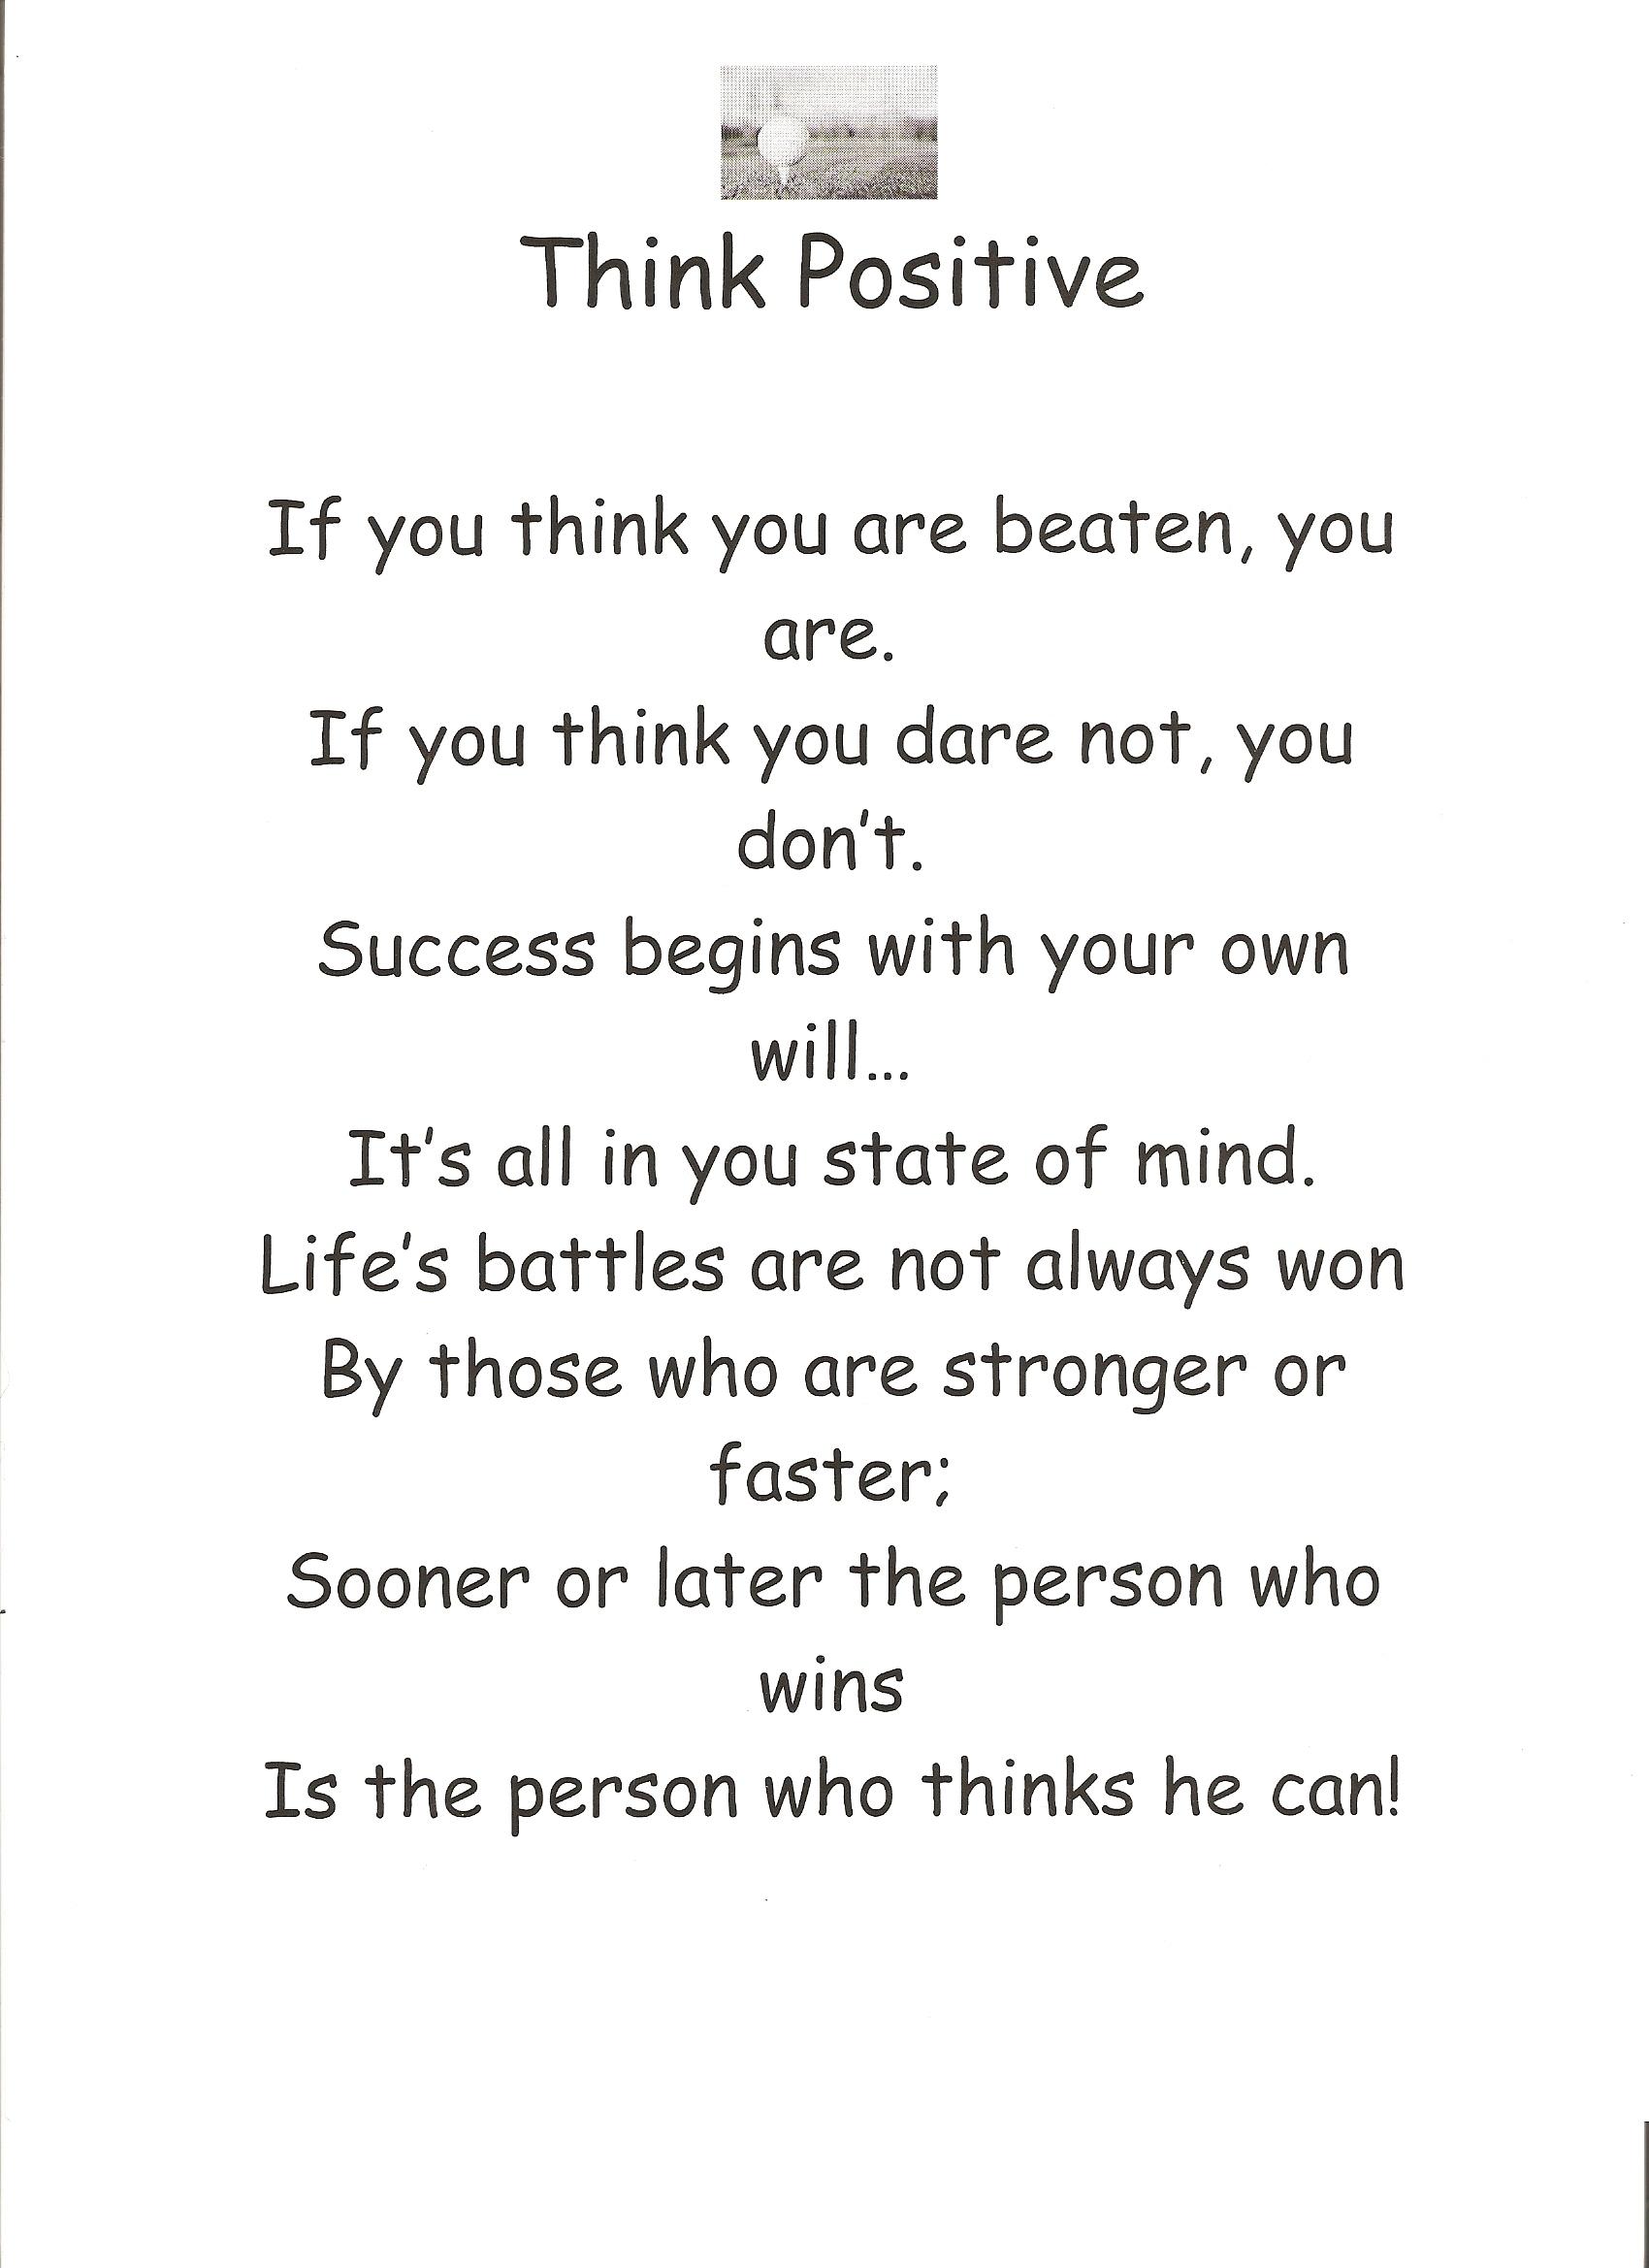 Think Positive I Am